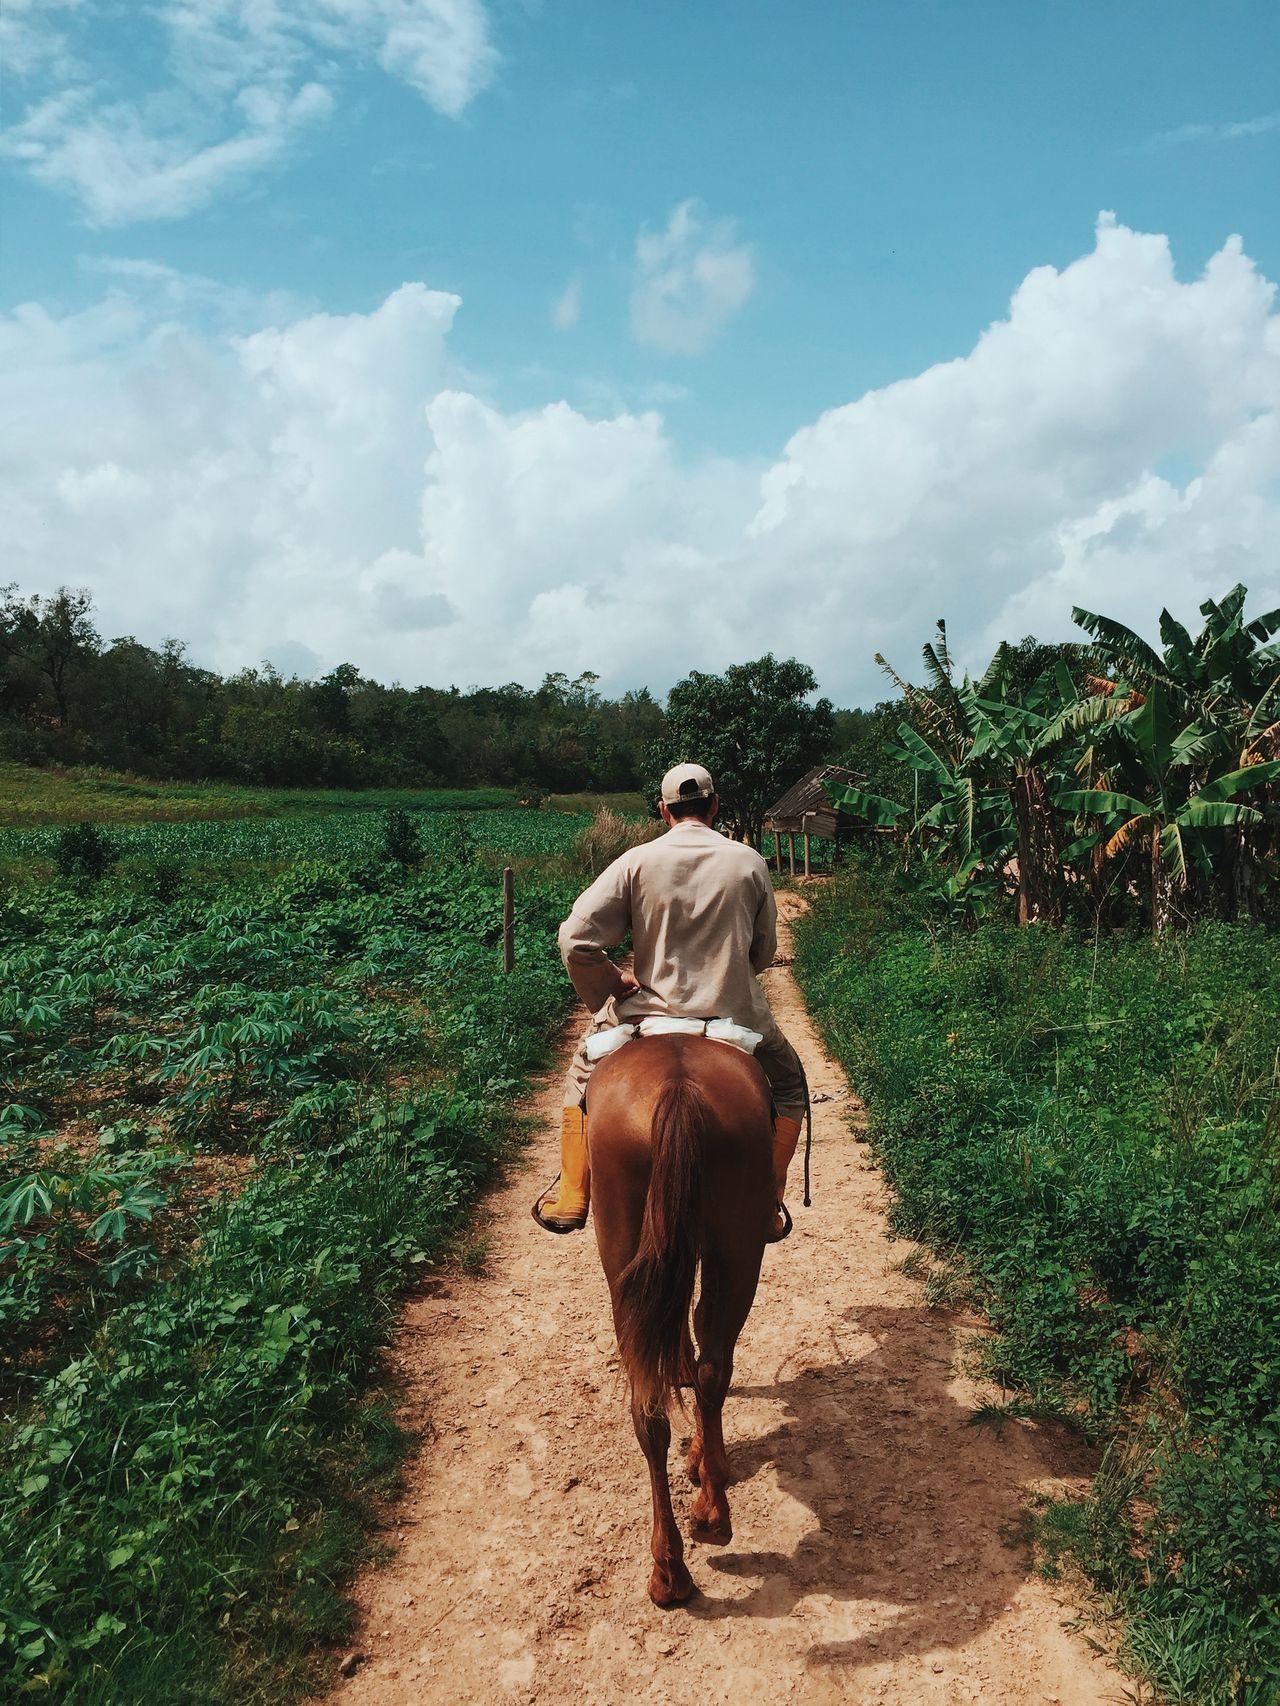 Beautiful stock photos of tiere, horse, mammal, domestic animals, full length